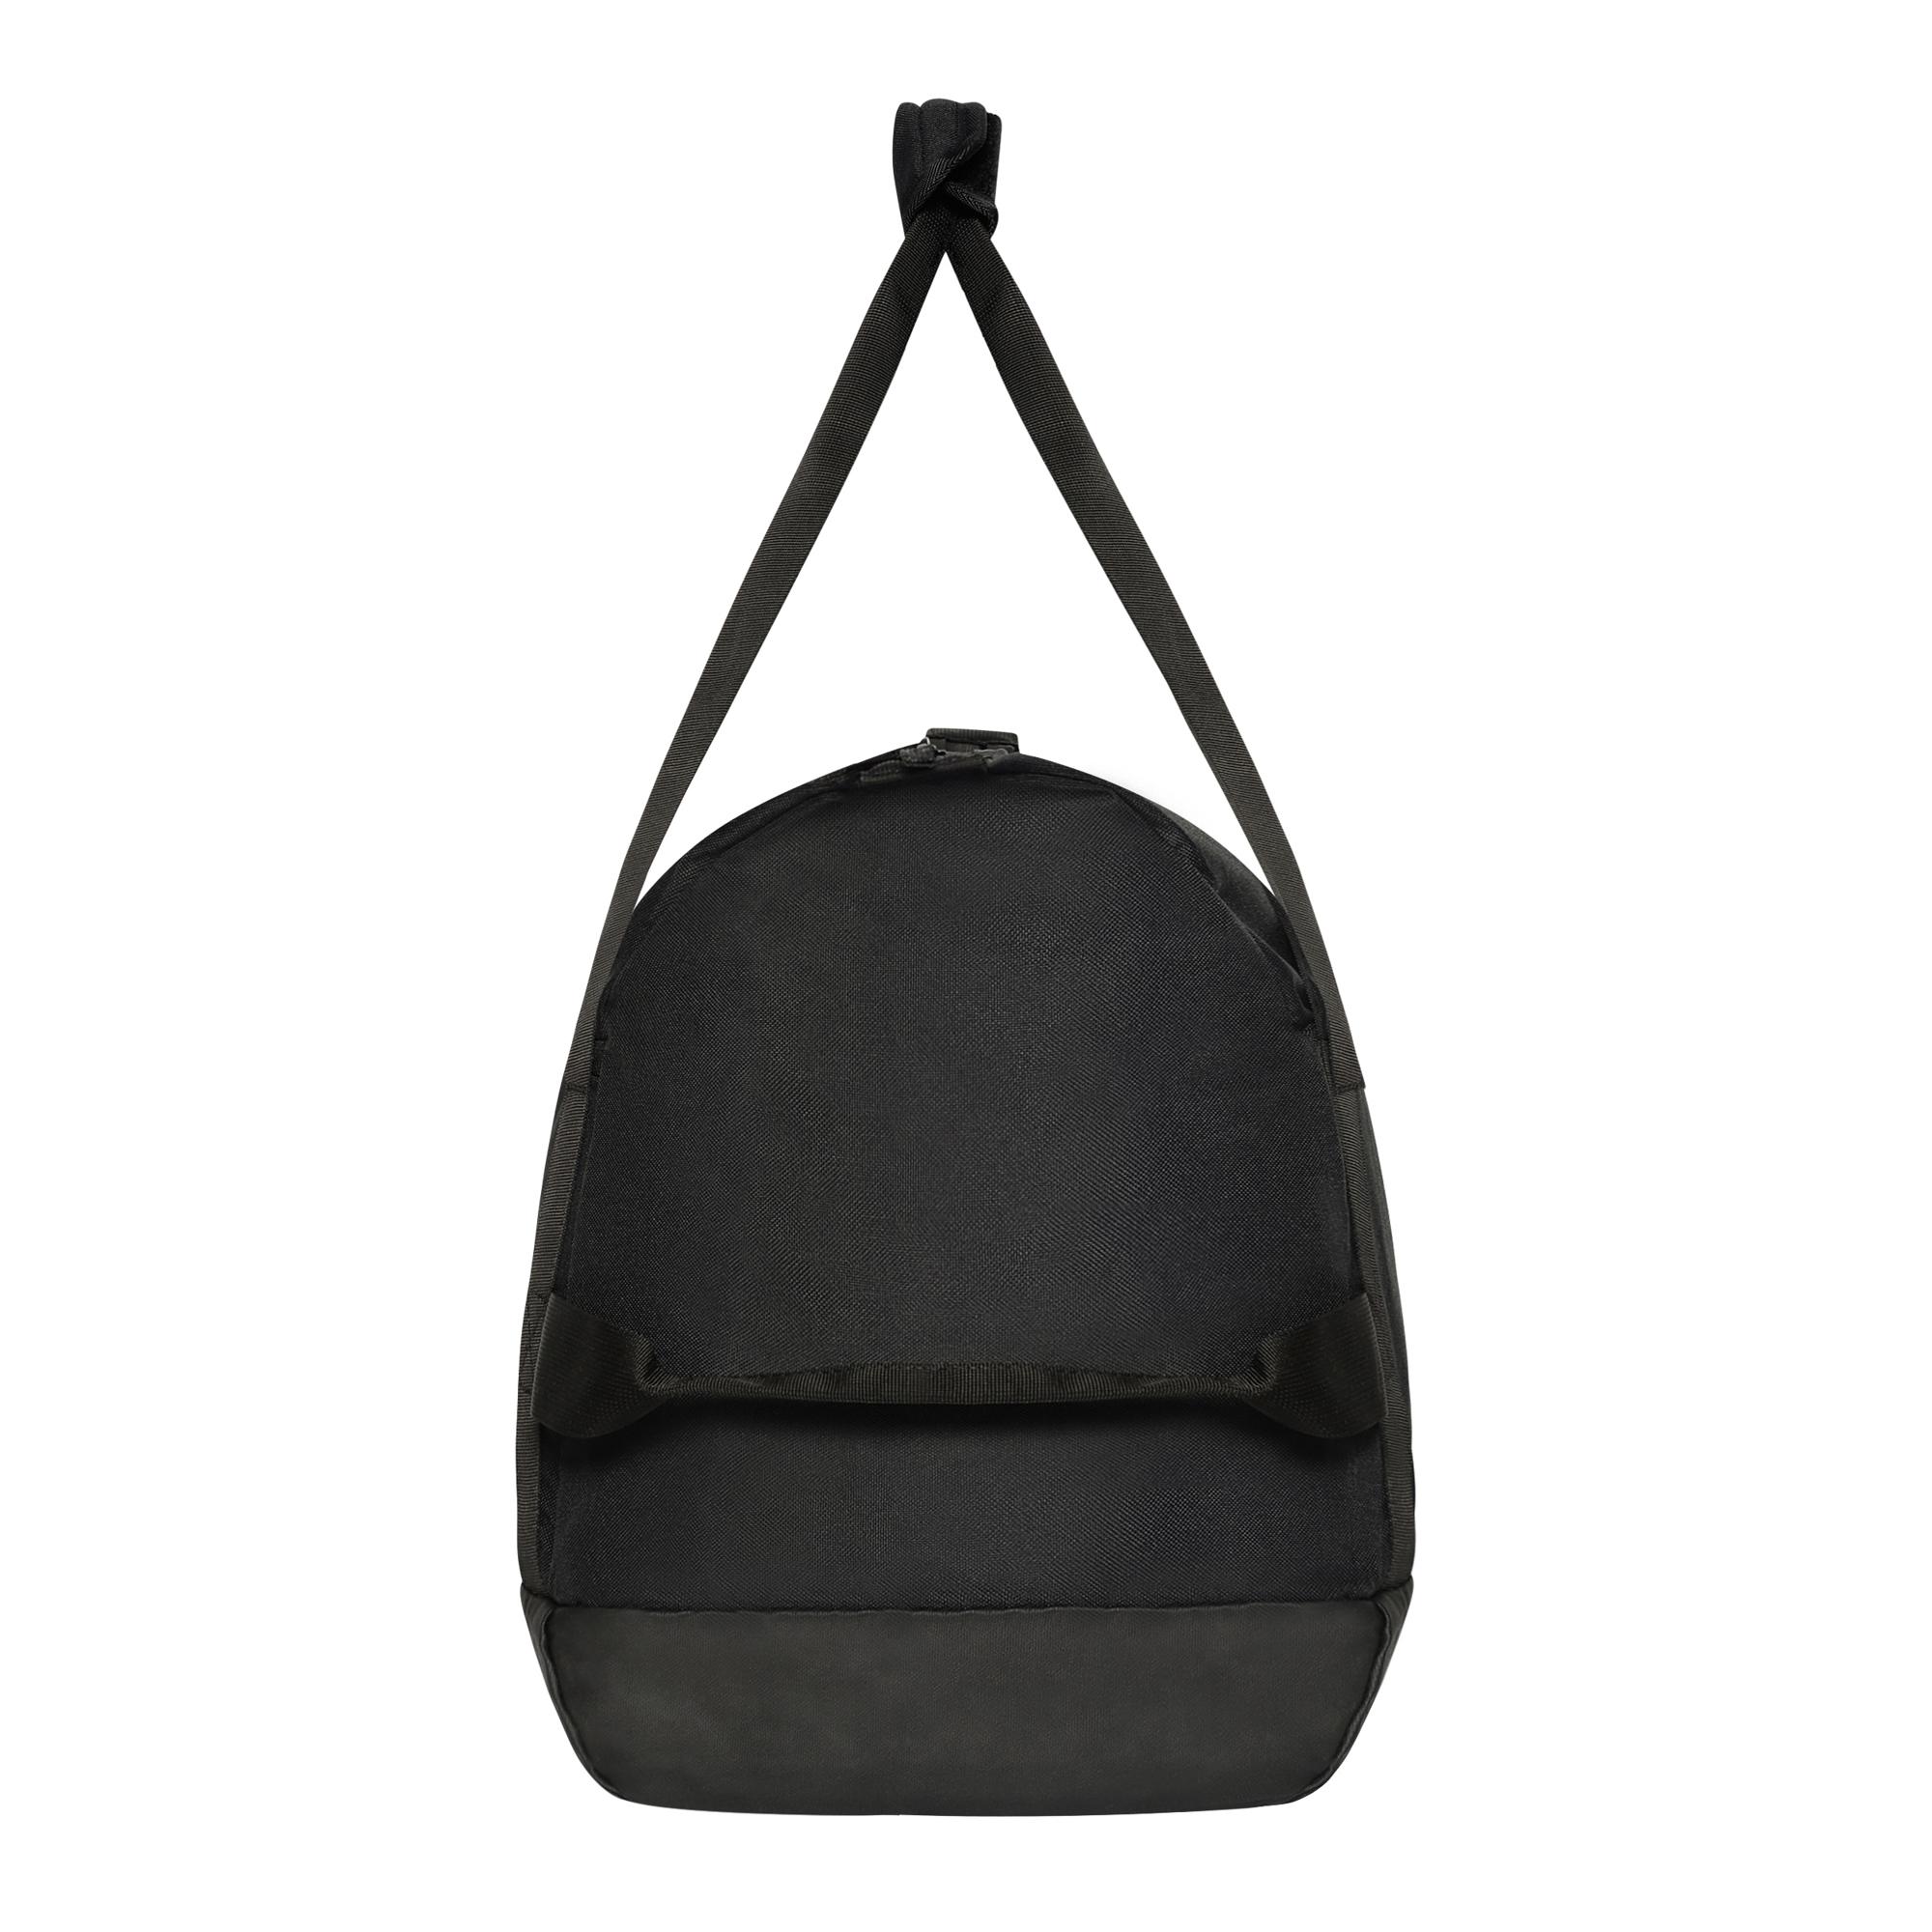 4ff6b00e504ae Nike Sporttasche Club Team Medium BA5504 010 schwarz Accessoires Taschen